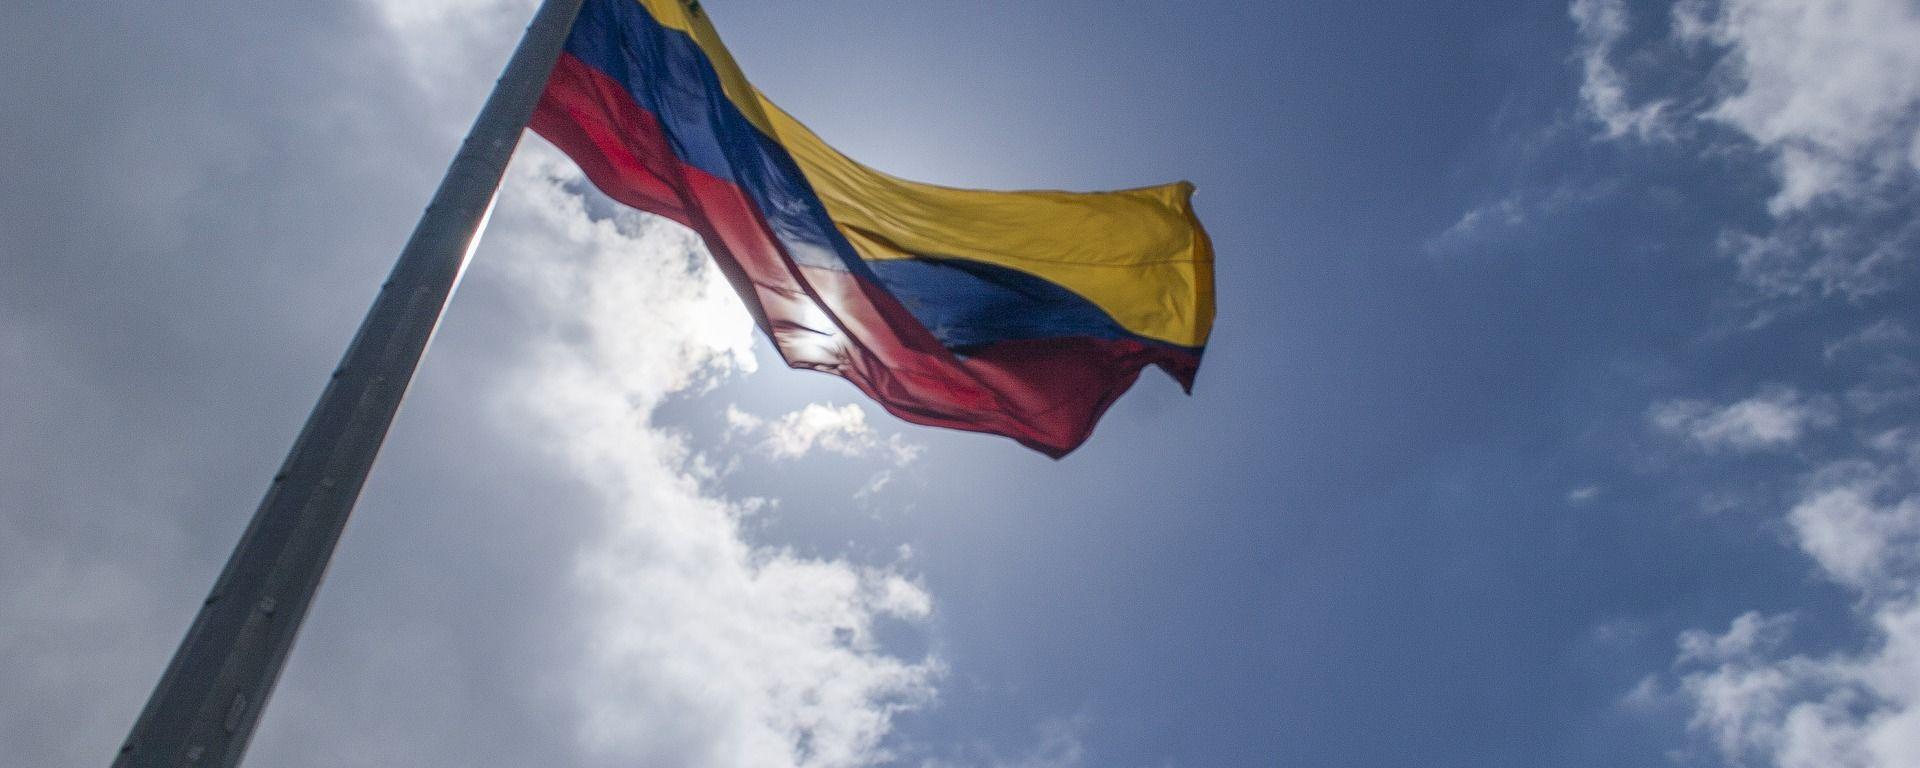 Bandera de Venezuela - Sputnik Mundo, 1920, 16.07.2021